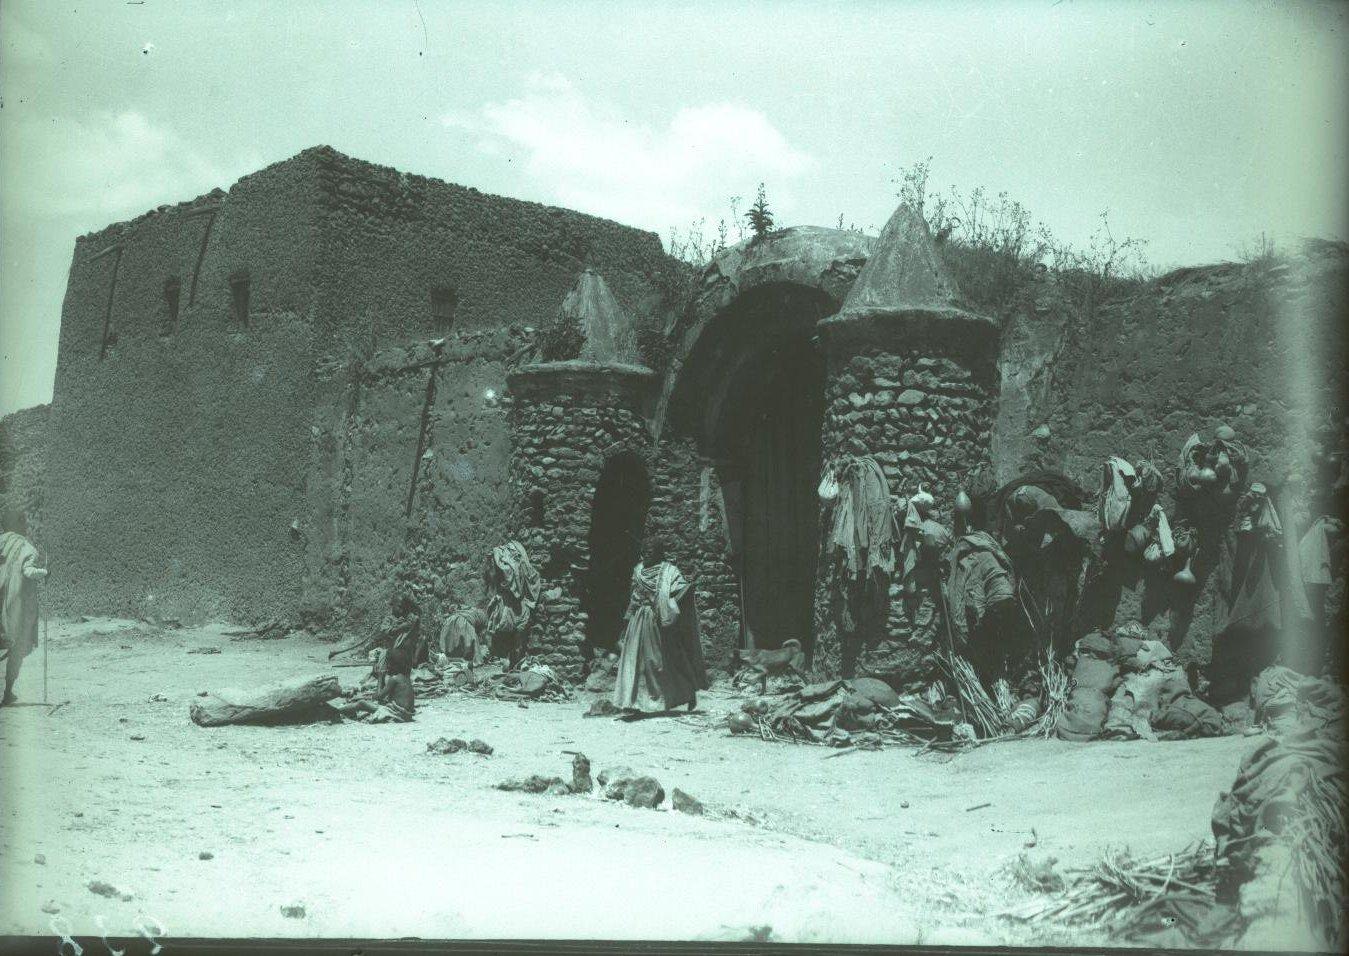 238. Абиссиния, провинция Харар, г. Харар. Место кочевки прокаженных